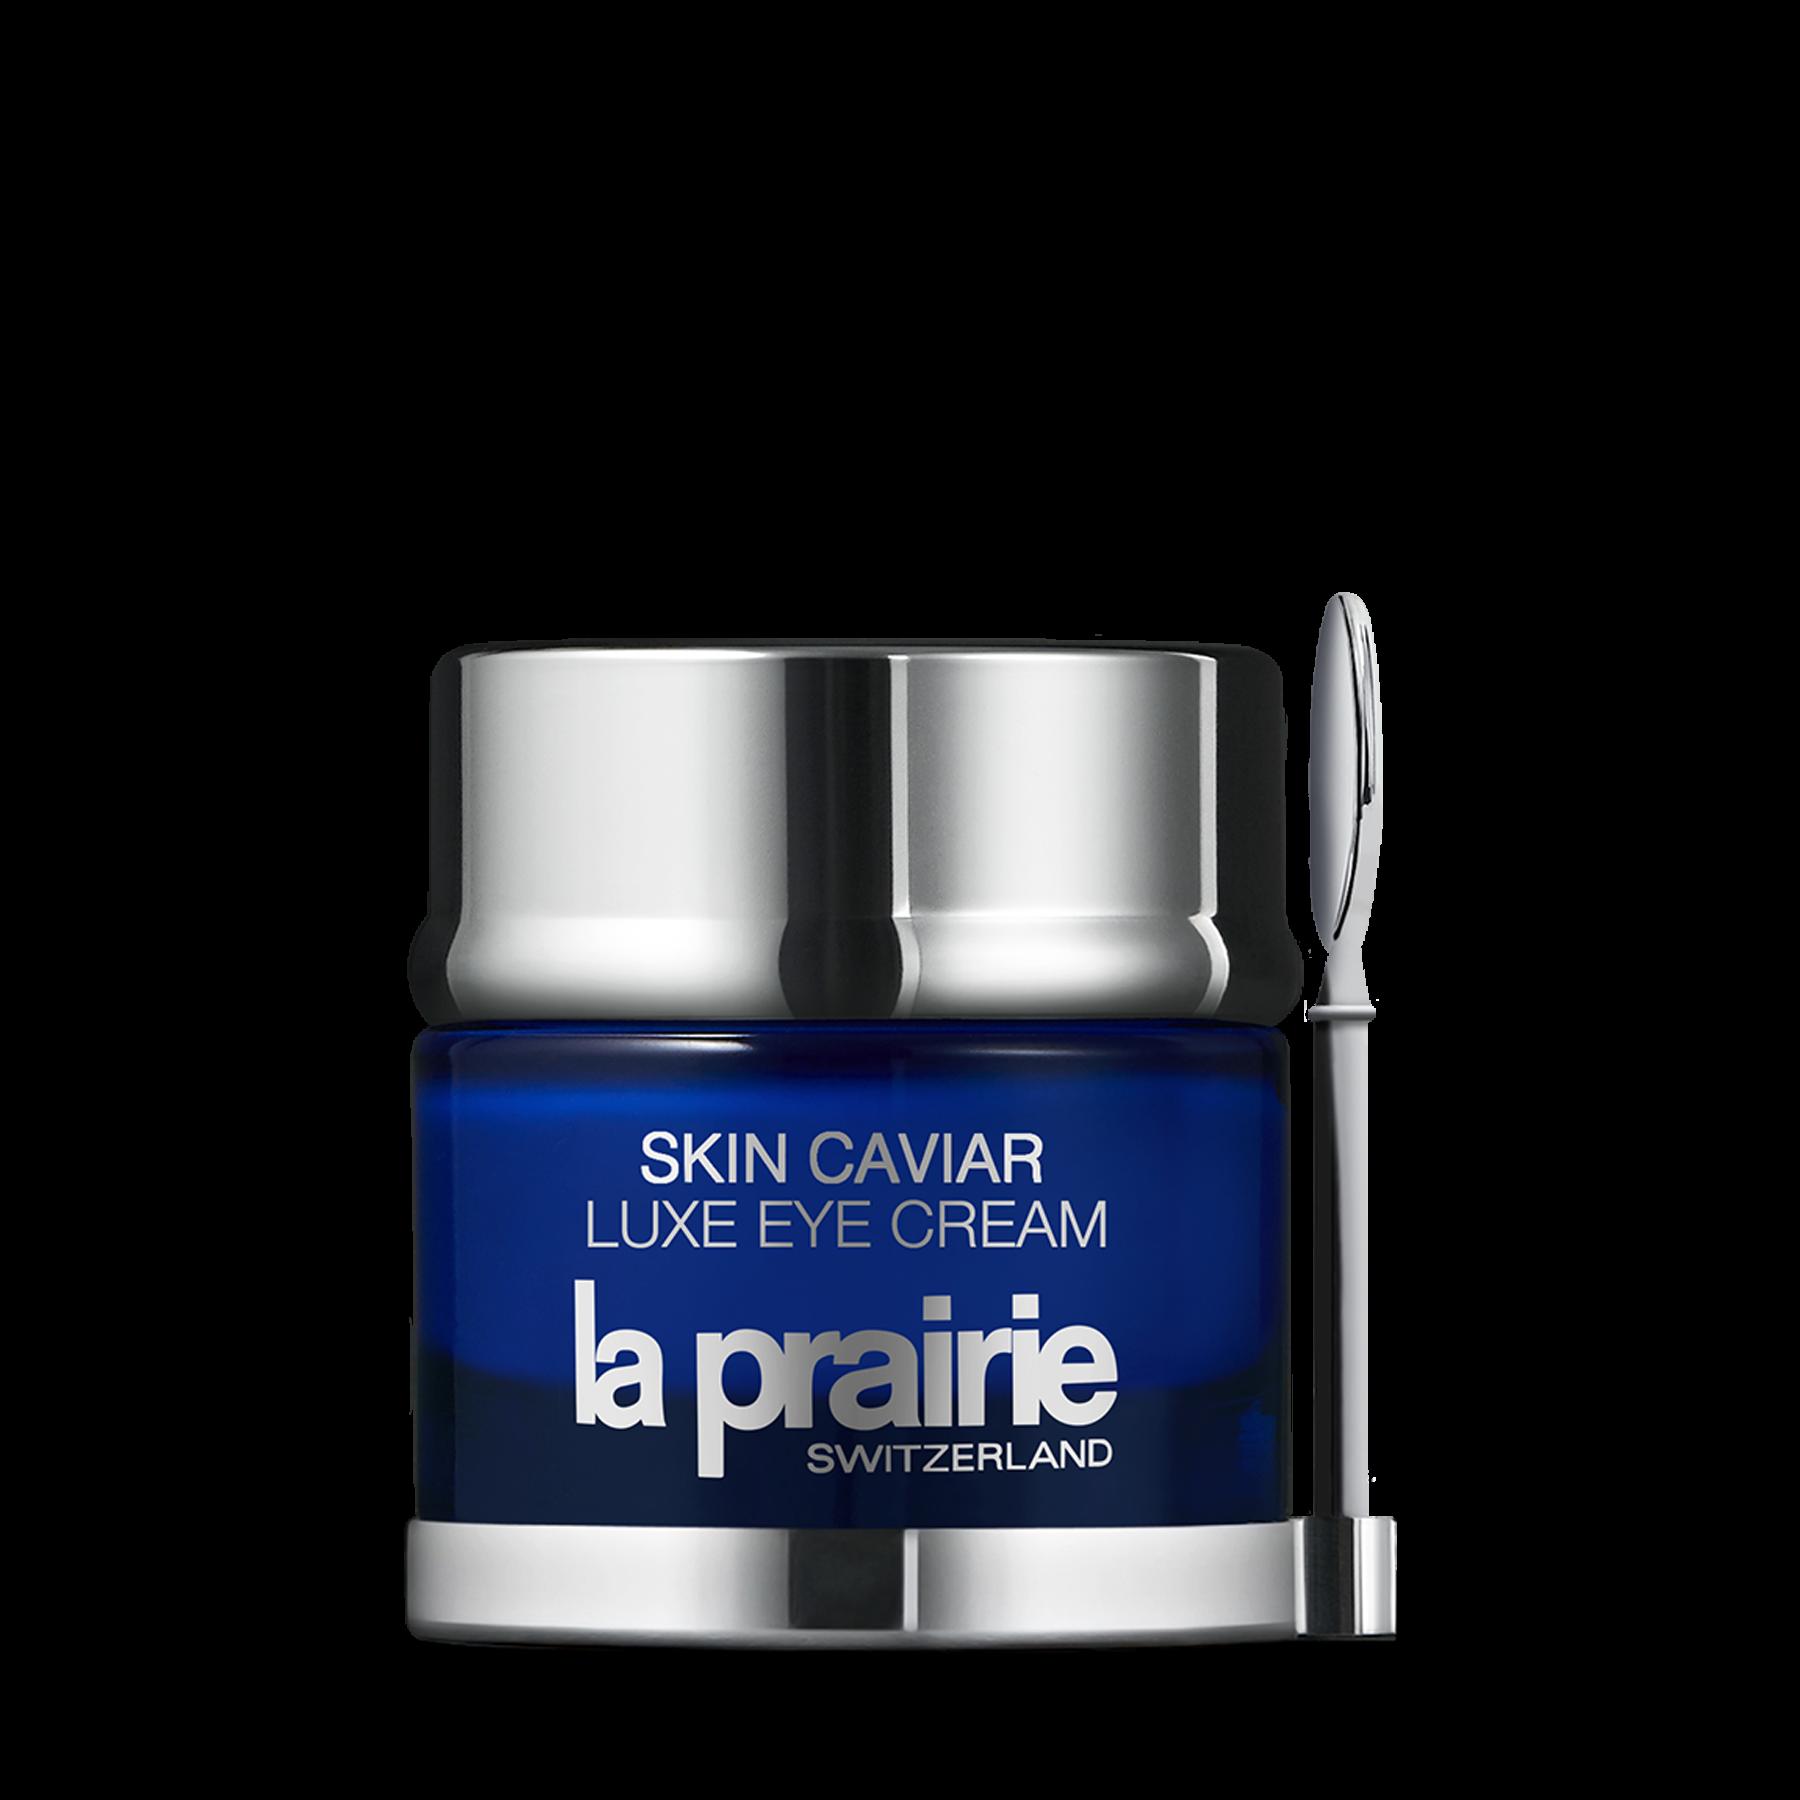 sản phẩm chăm sóc vùng mắt La prairie skin caviar luxe eye cream